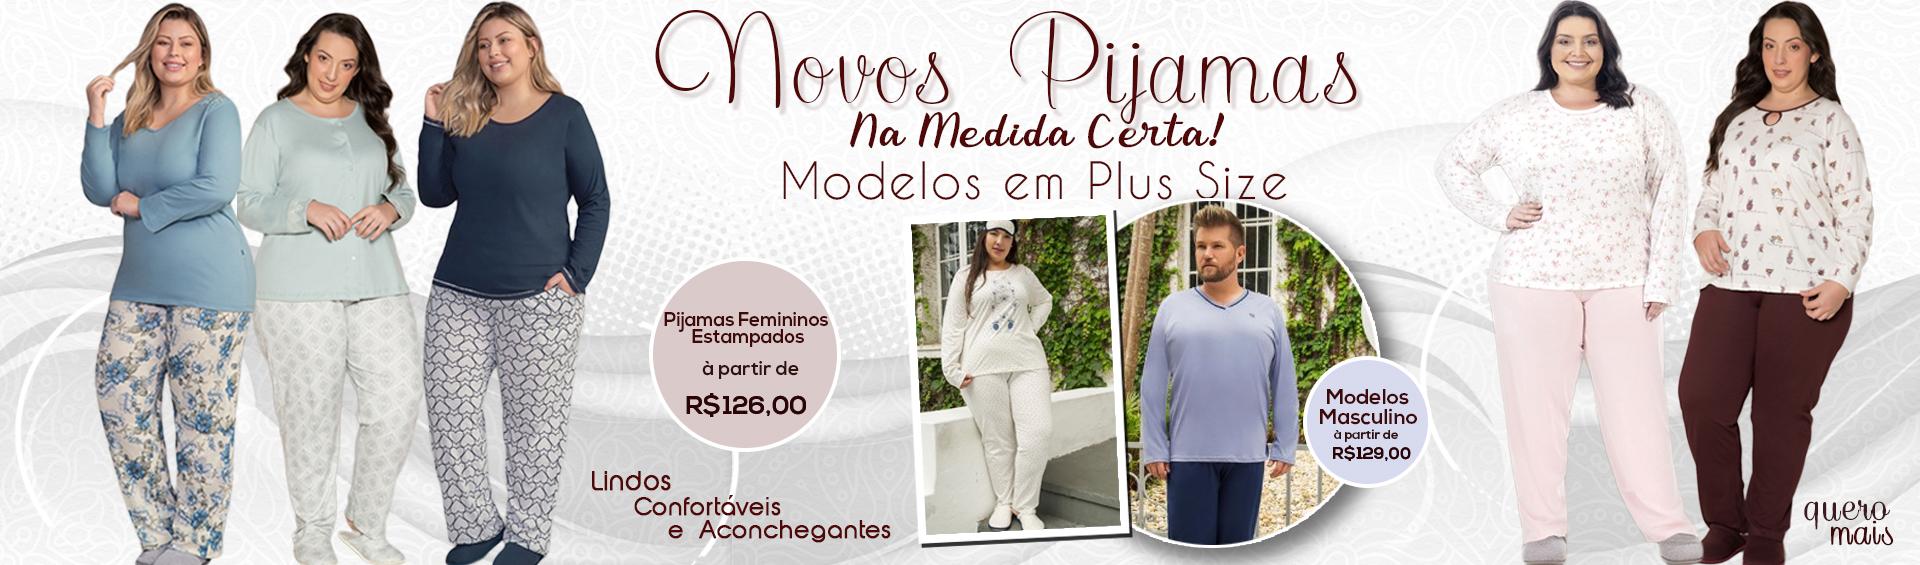 Pijamas Quentinhos Plus Size